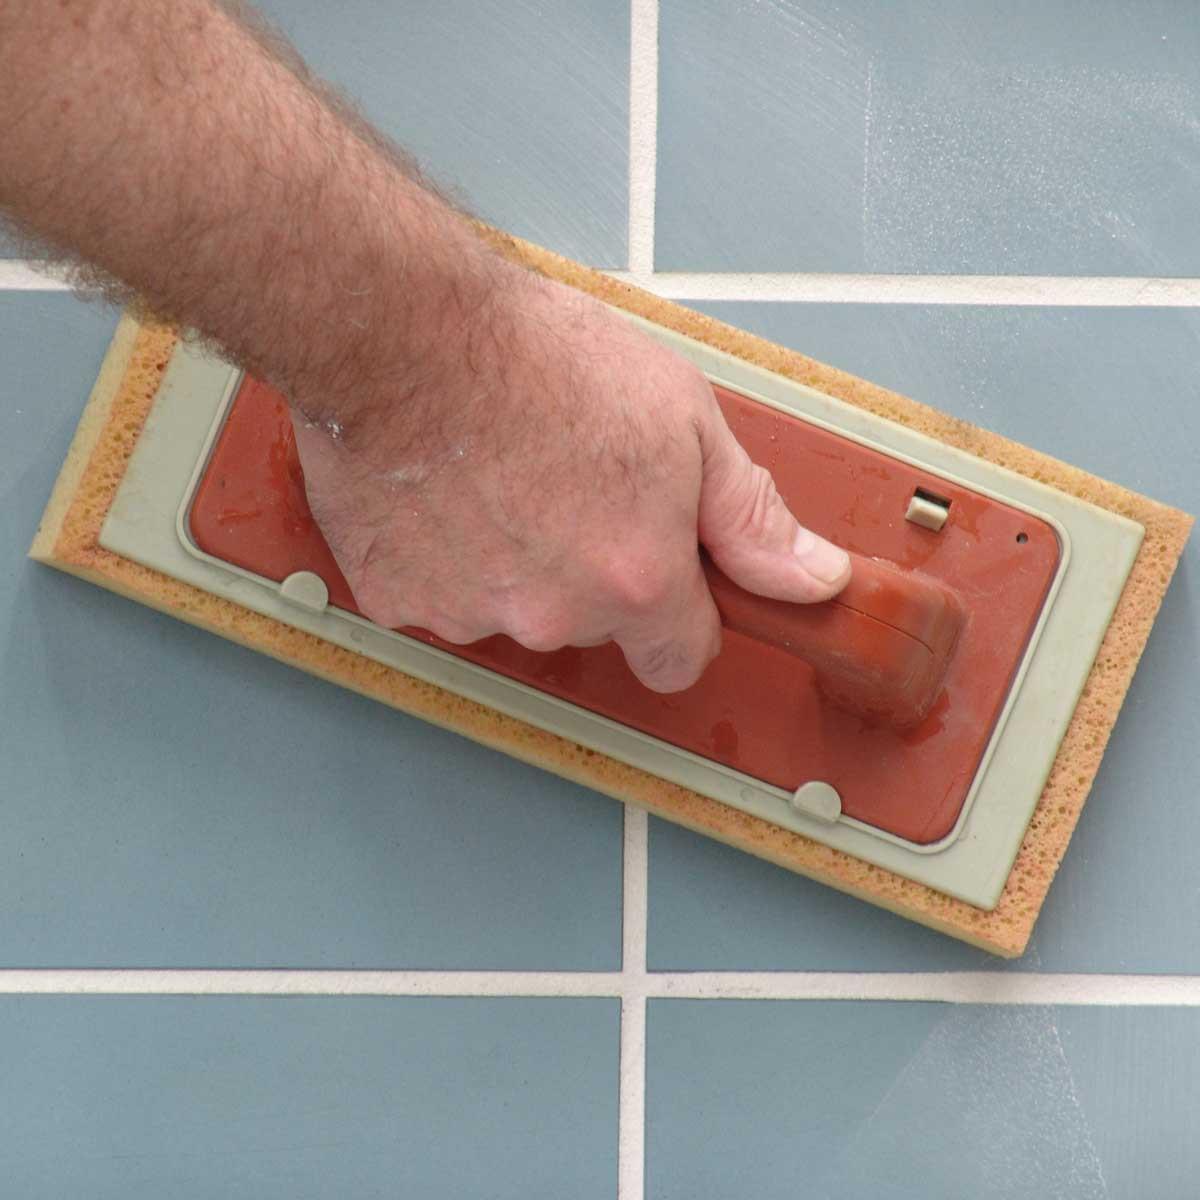 Raimondi Smart sponge clean tile